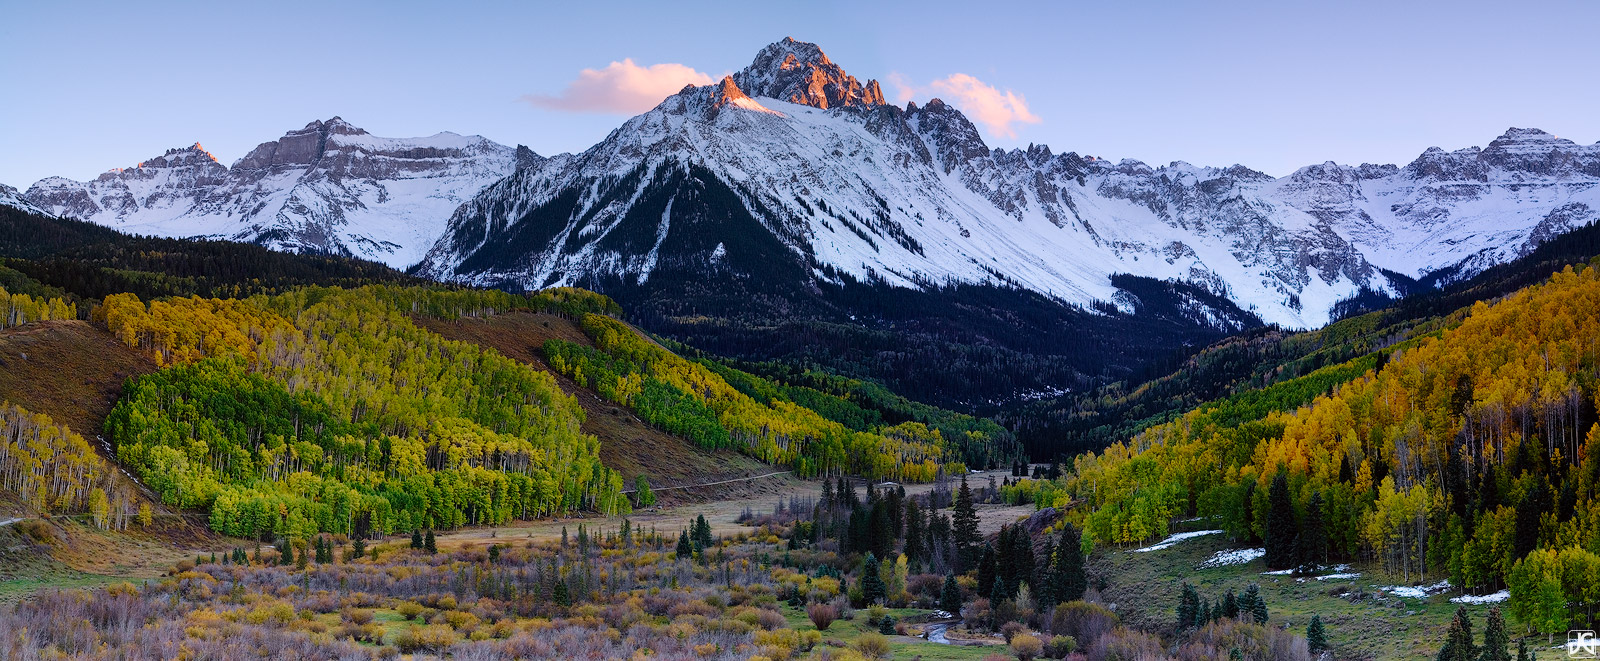 Colorado, aspen, forest, autumn, Sneffels, Ridgway, San Juan Mountains, panoramic, photo